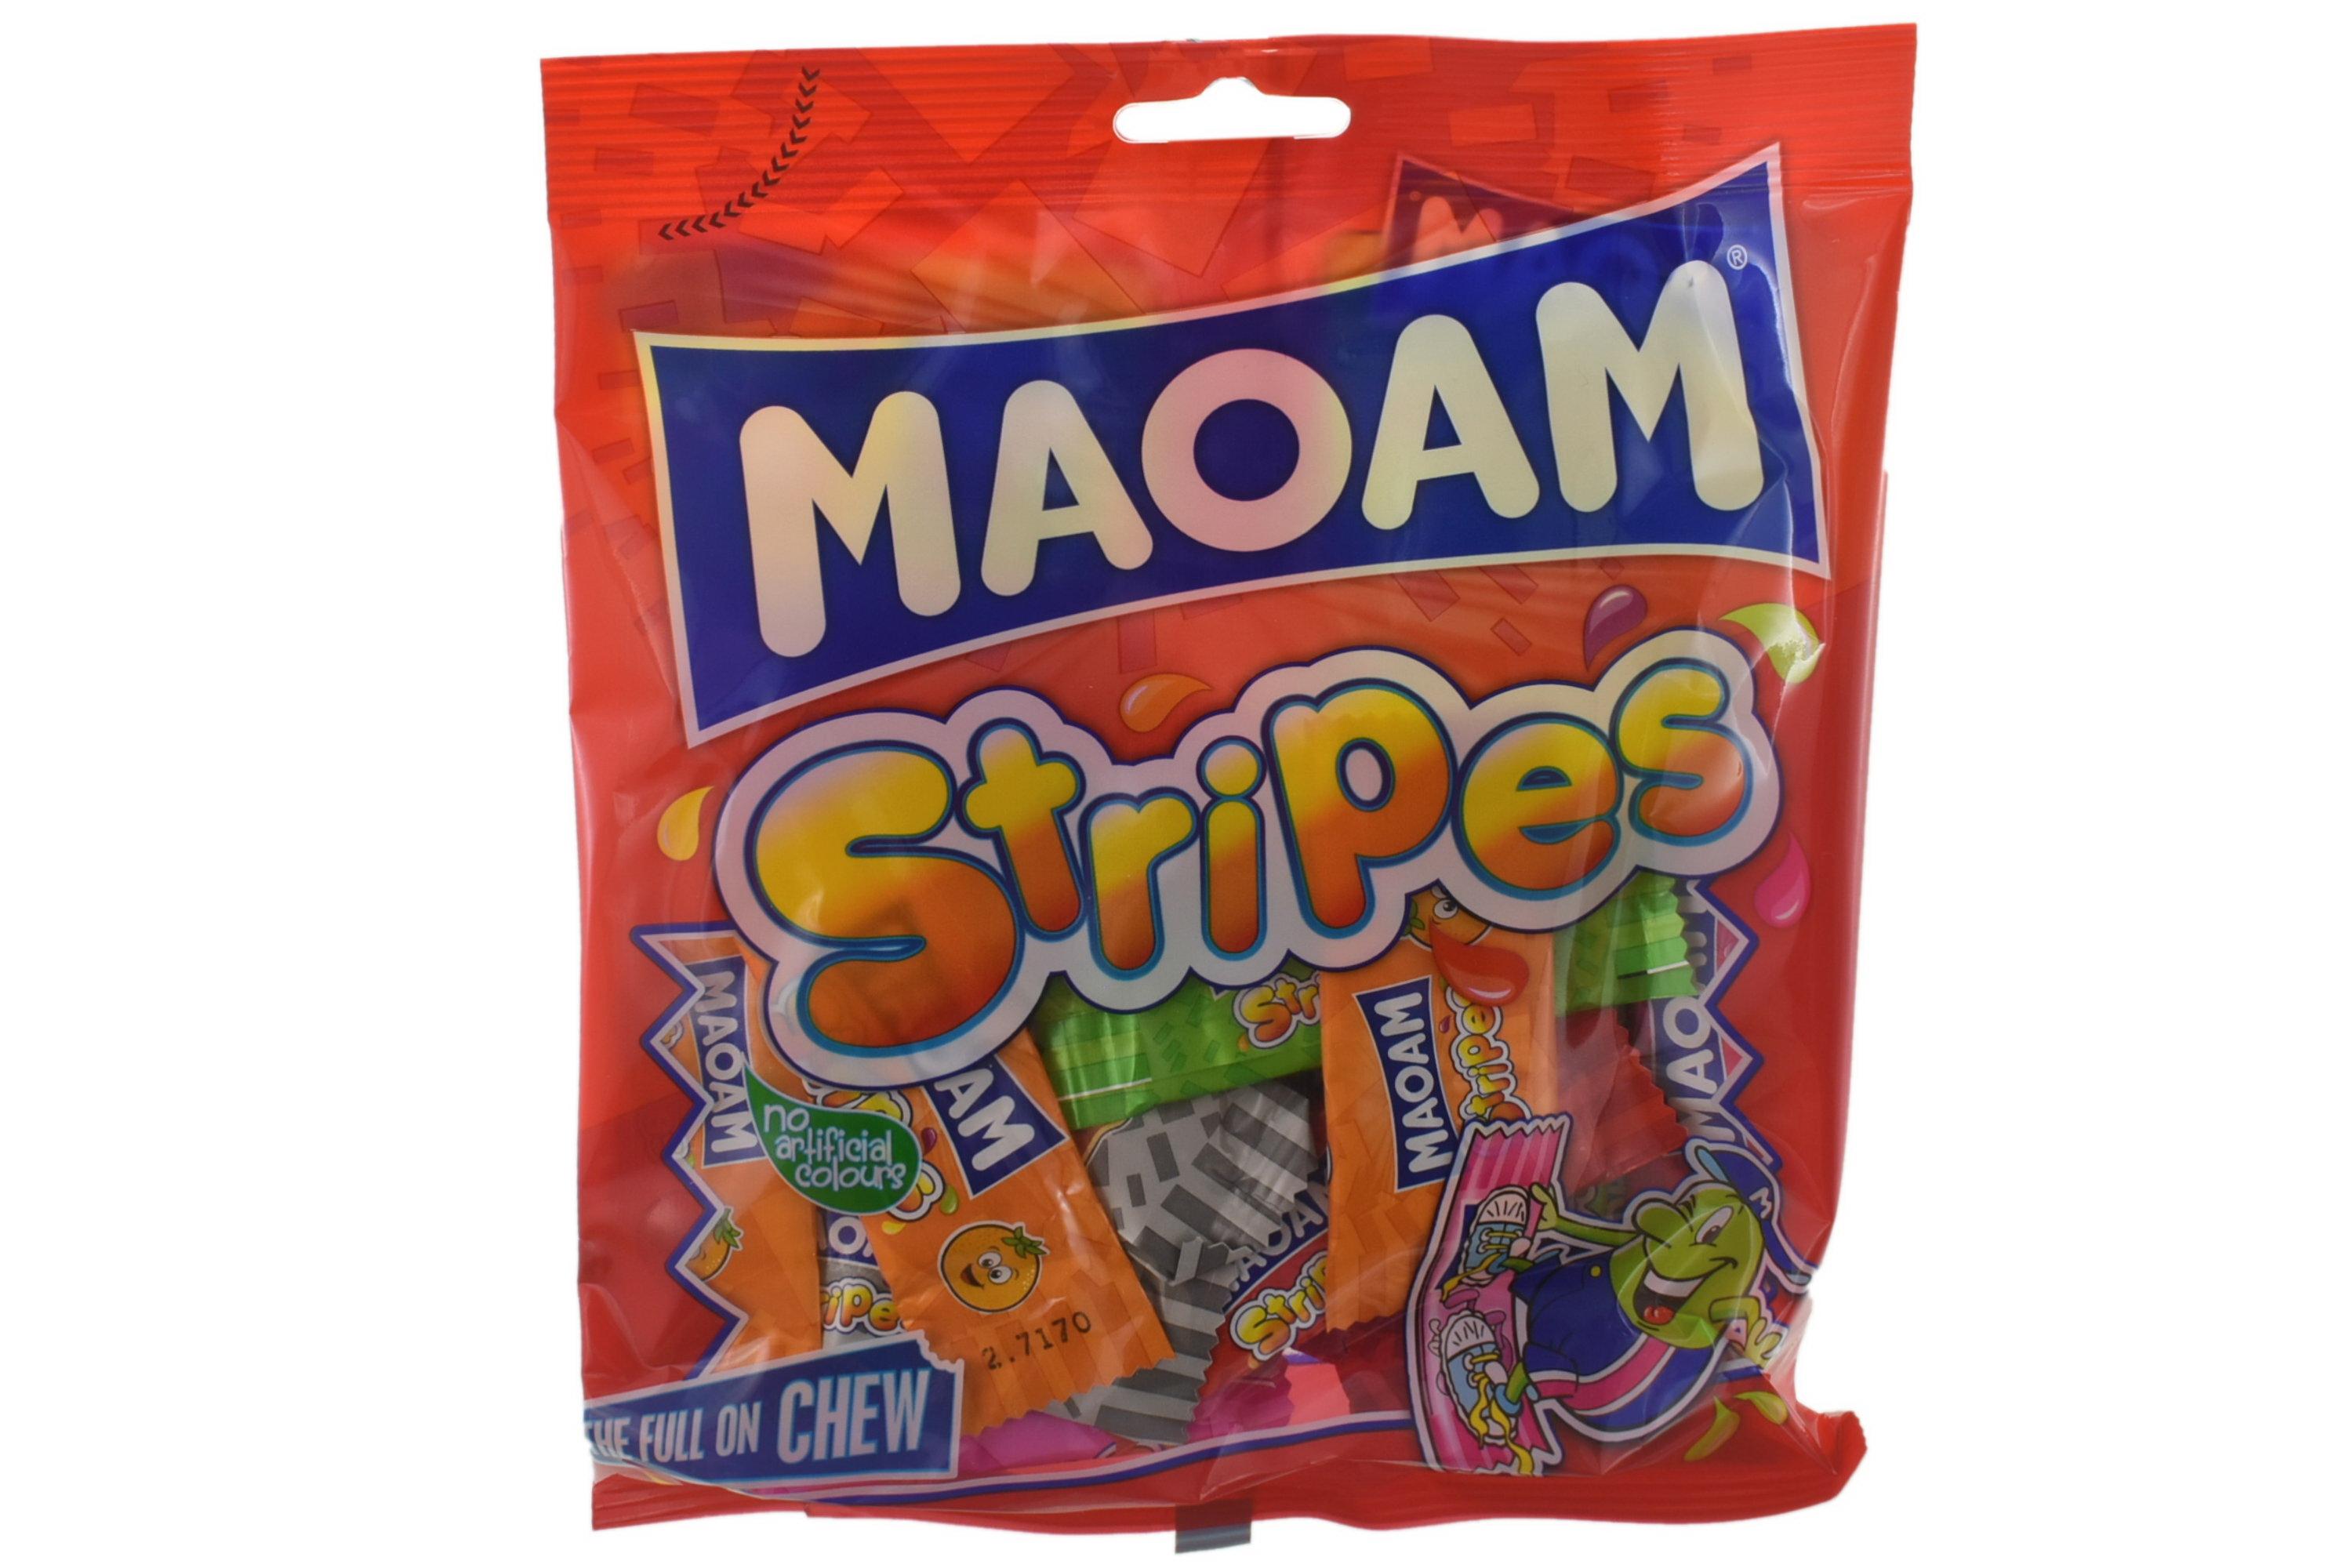 140g Maoam Stripes Chews Prepack - Haribo